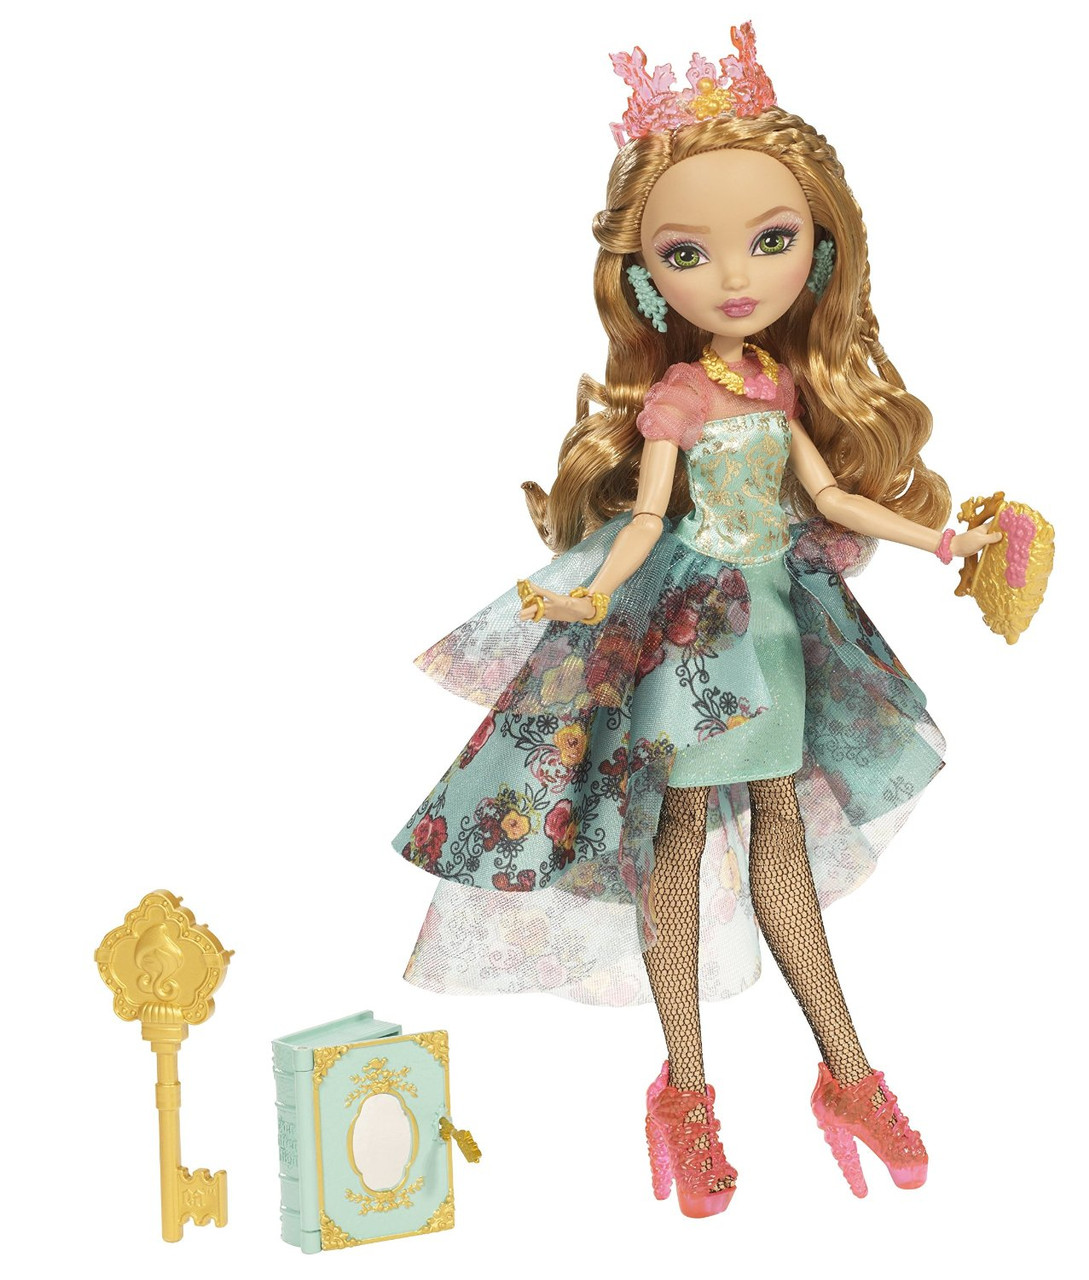 Кукла Эвер Афтер Хай Эшлин Элла серия  День наследия Ever After High Ashlynn Ella Doll Legacy Day